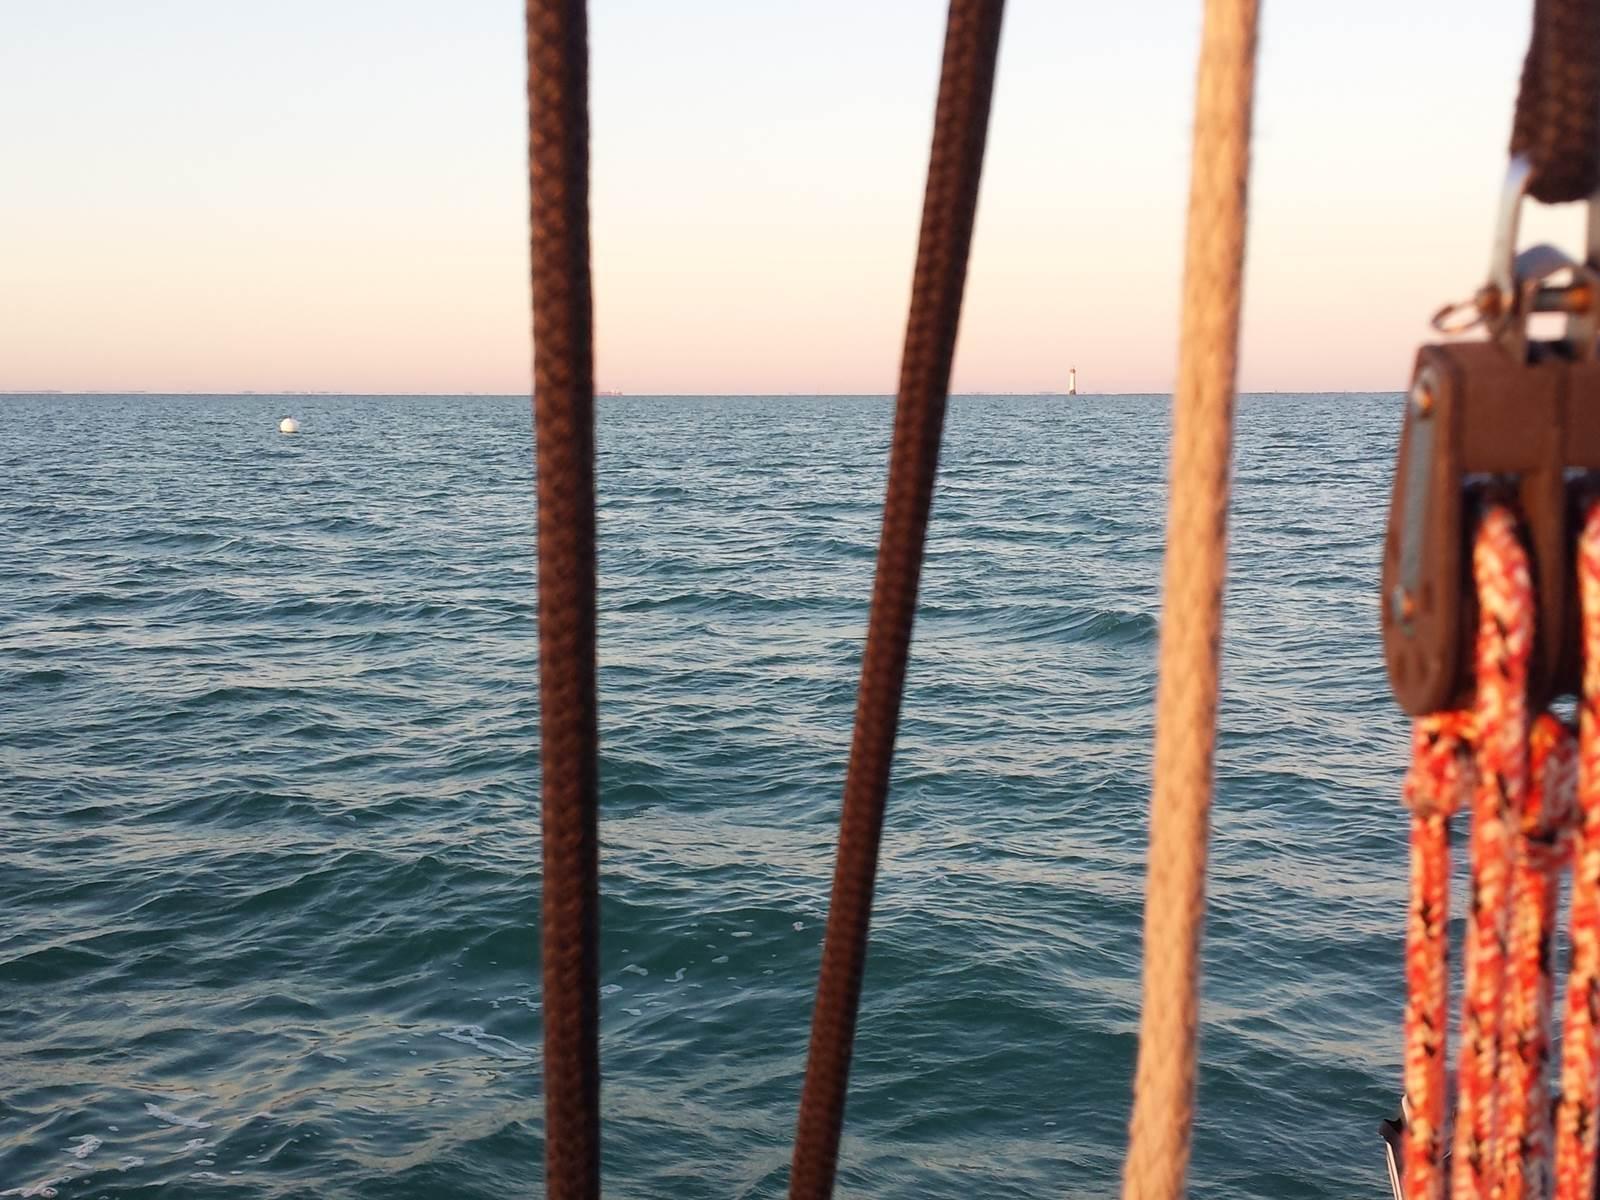 océan lumière du matin et pataras